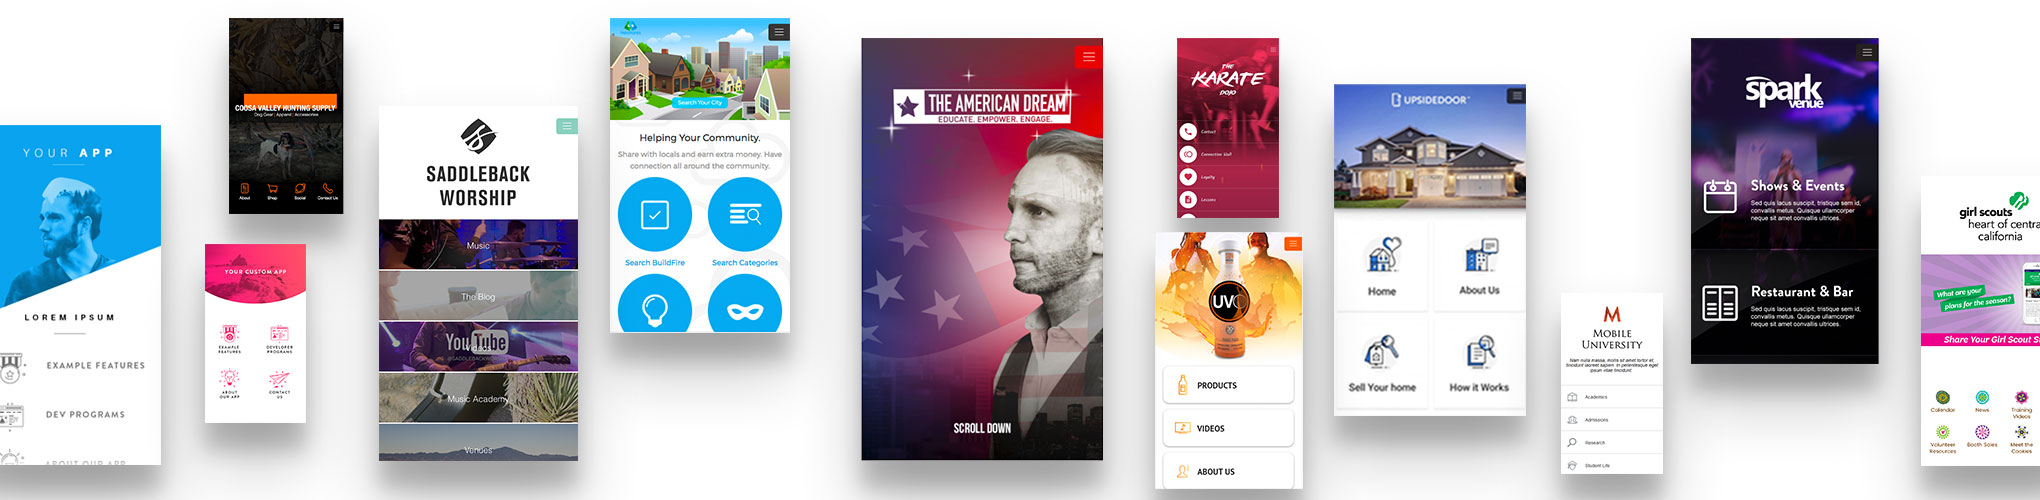 app-screenshotshelper4web